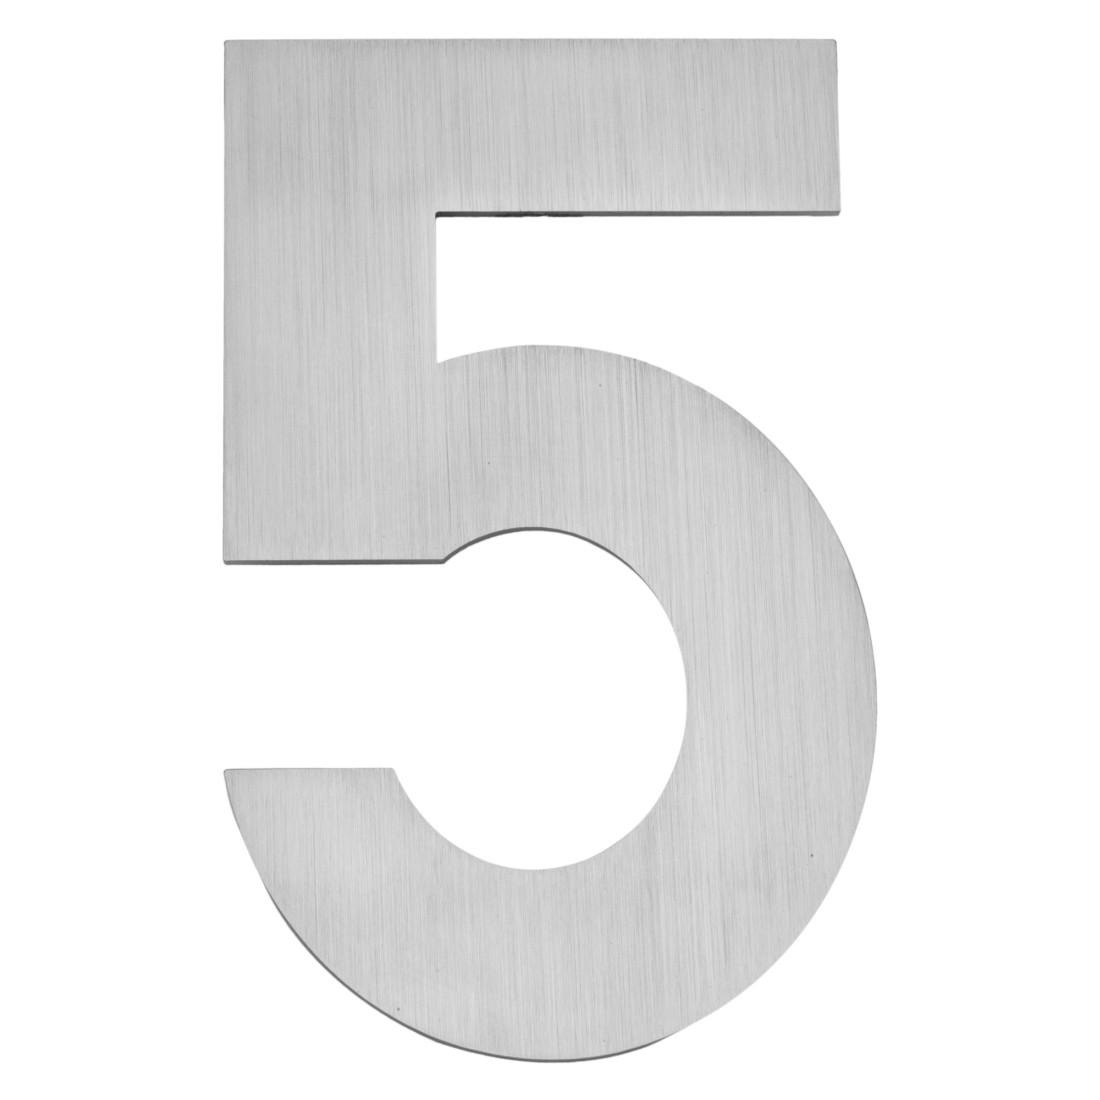 Hausnummer zum Aufschrauben 5 - Matt Gebürstet Edelstahl Matt Gebürstet Silber, Serafini